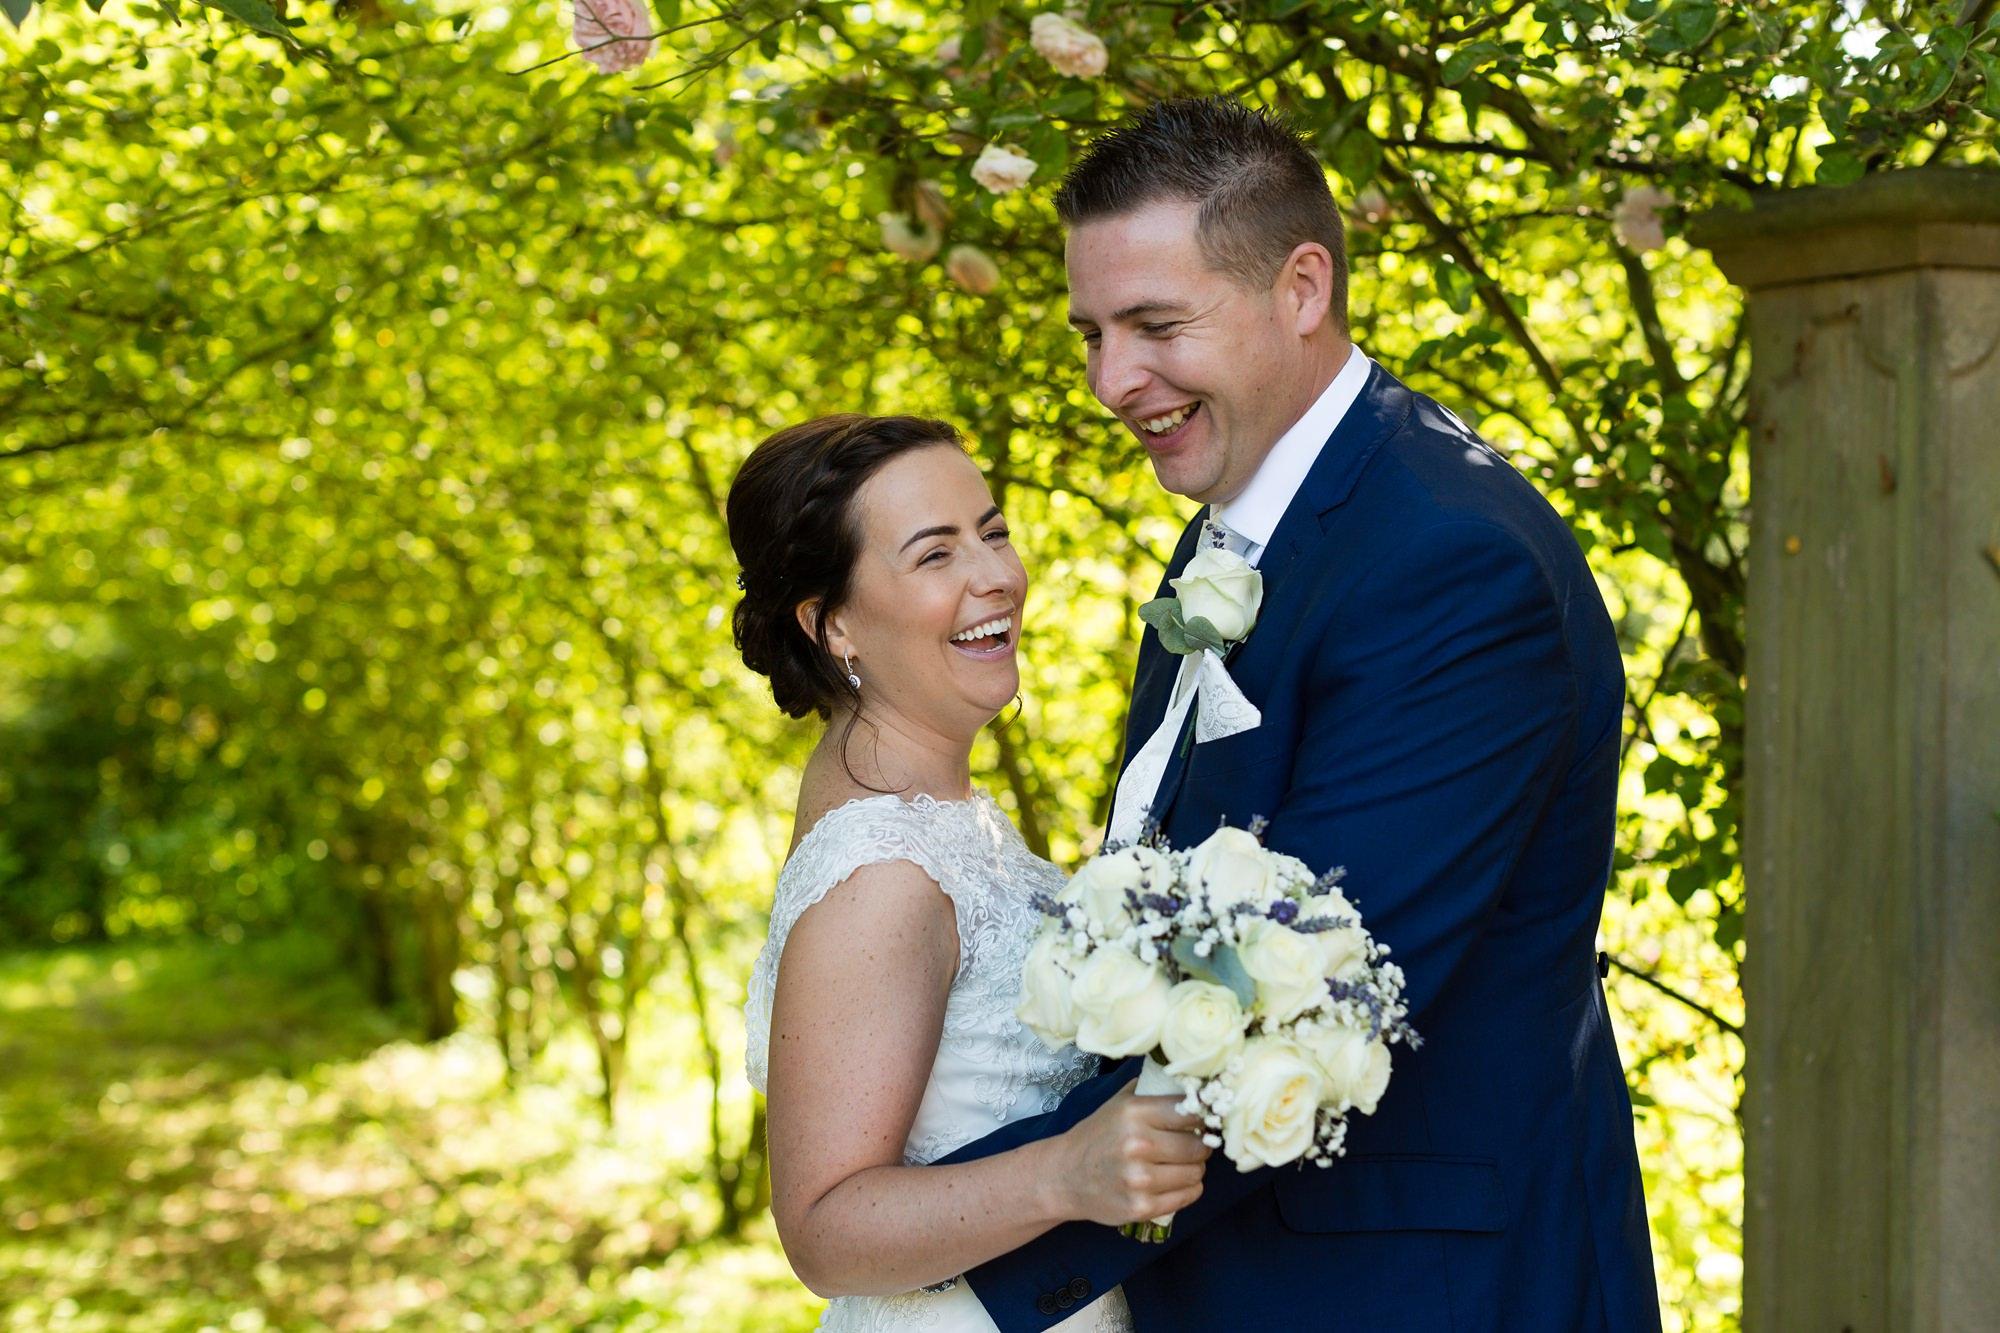 Fun wedding photography couple laughing